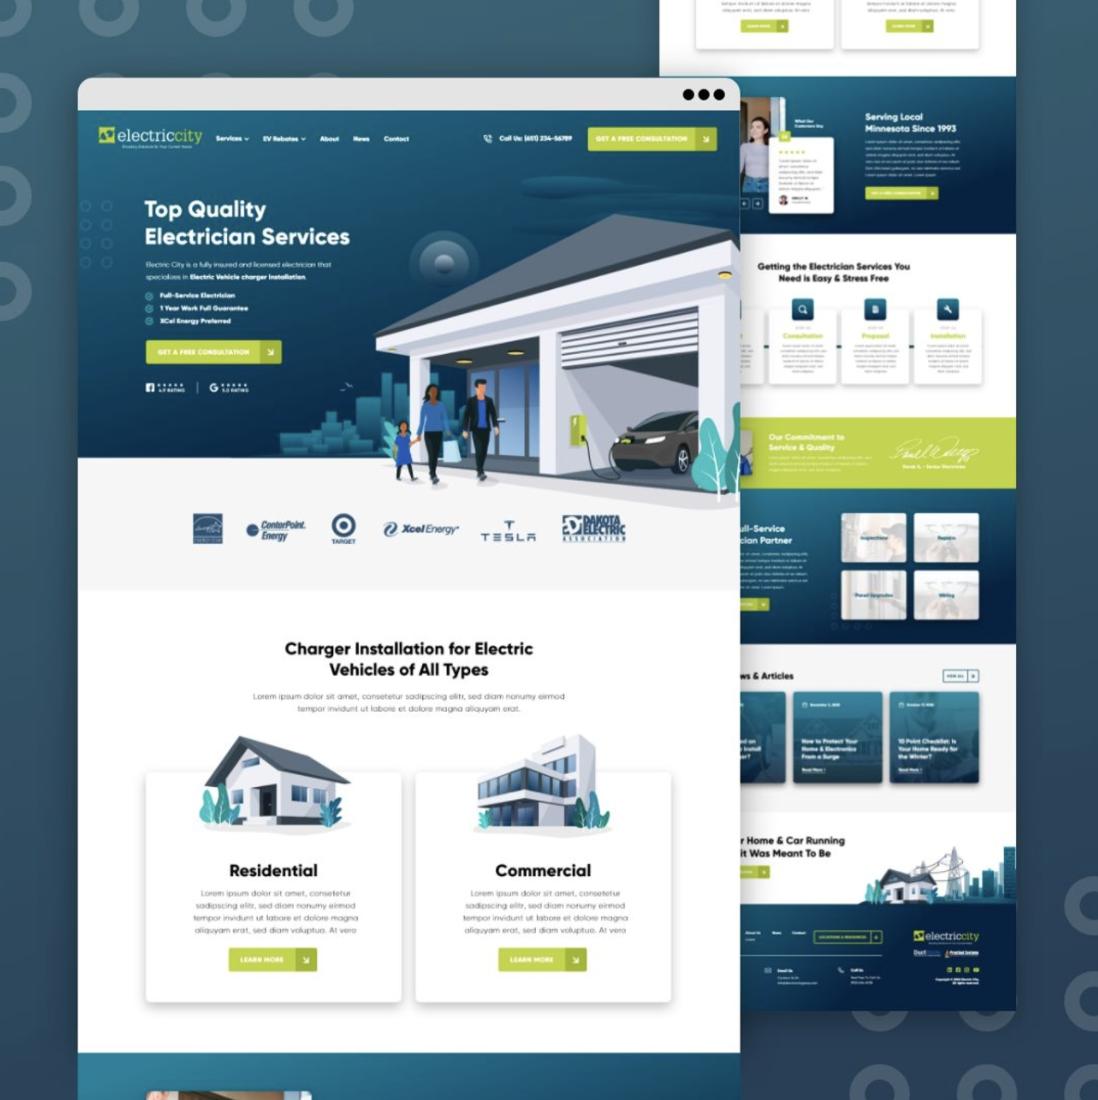 Electrician Marketing Lead Generation Website Design